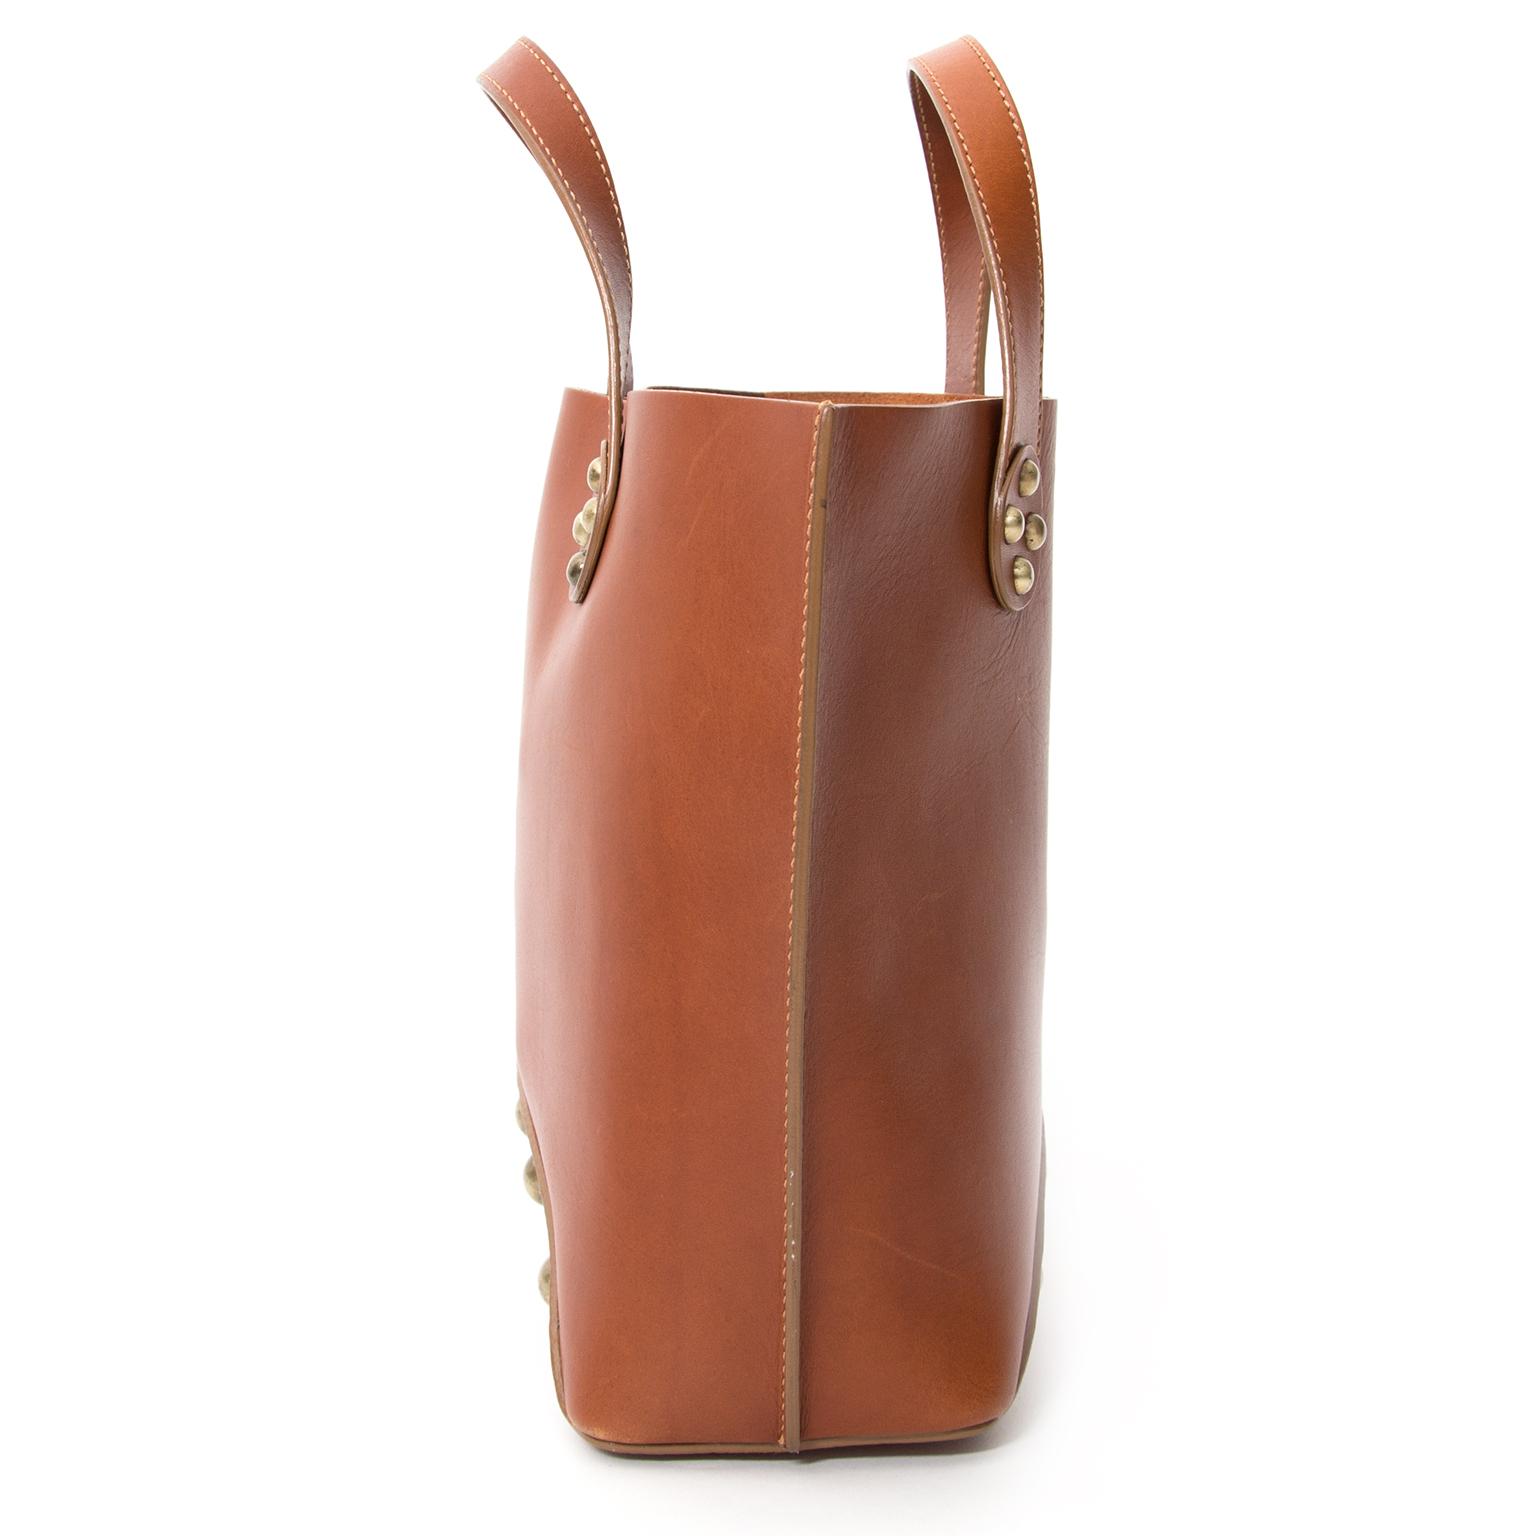 d4cb588bca ... buy safe online secondhand designer celine congnac tote bag at the best  price